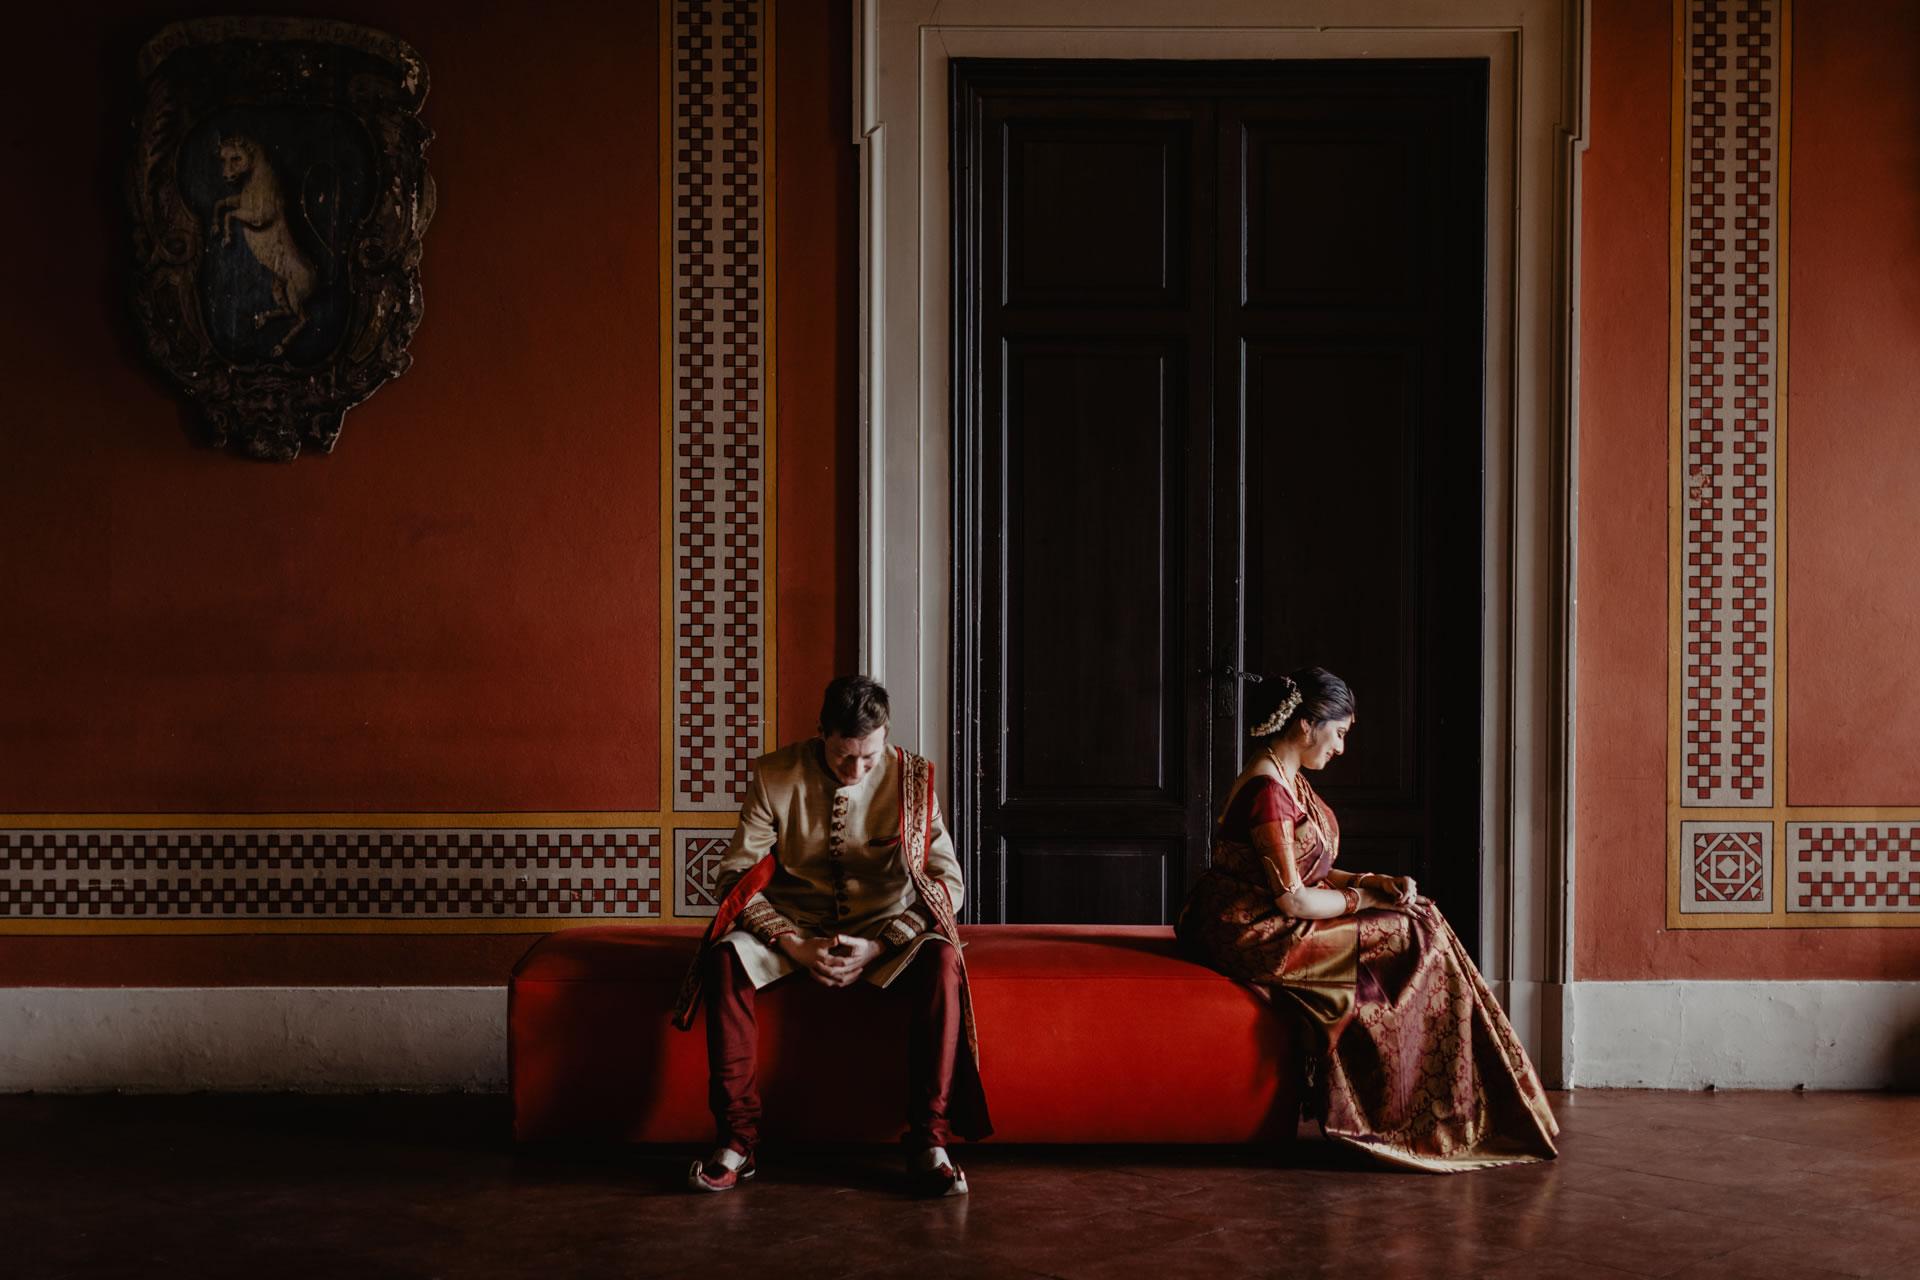 - 29 :: Indian wedding ceremony at Villa Pitiana :: Luxury wedding photography - 28 ::  - 29